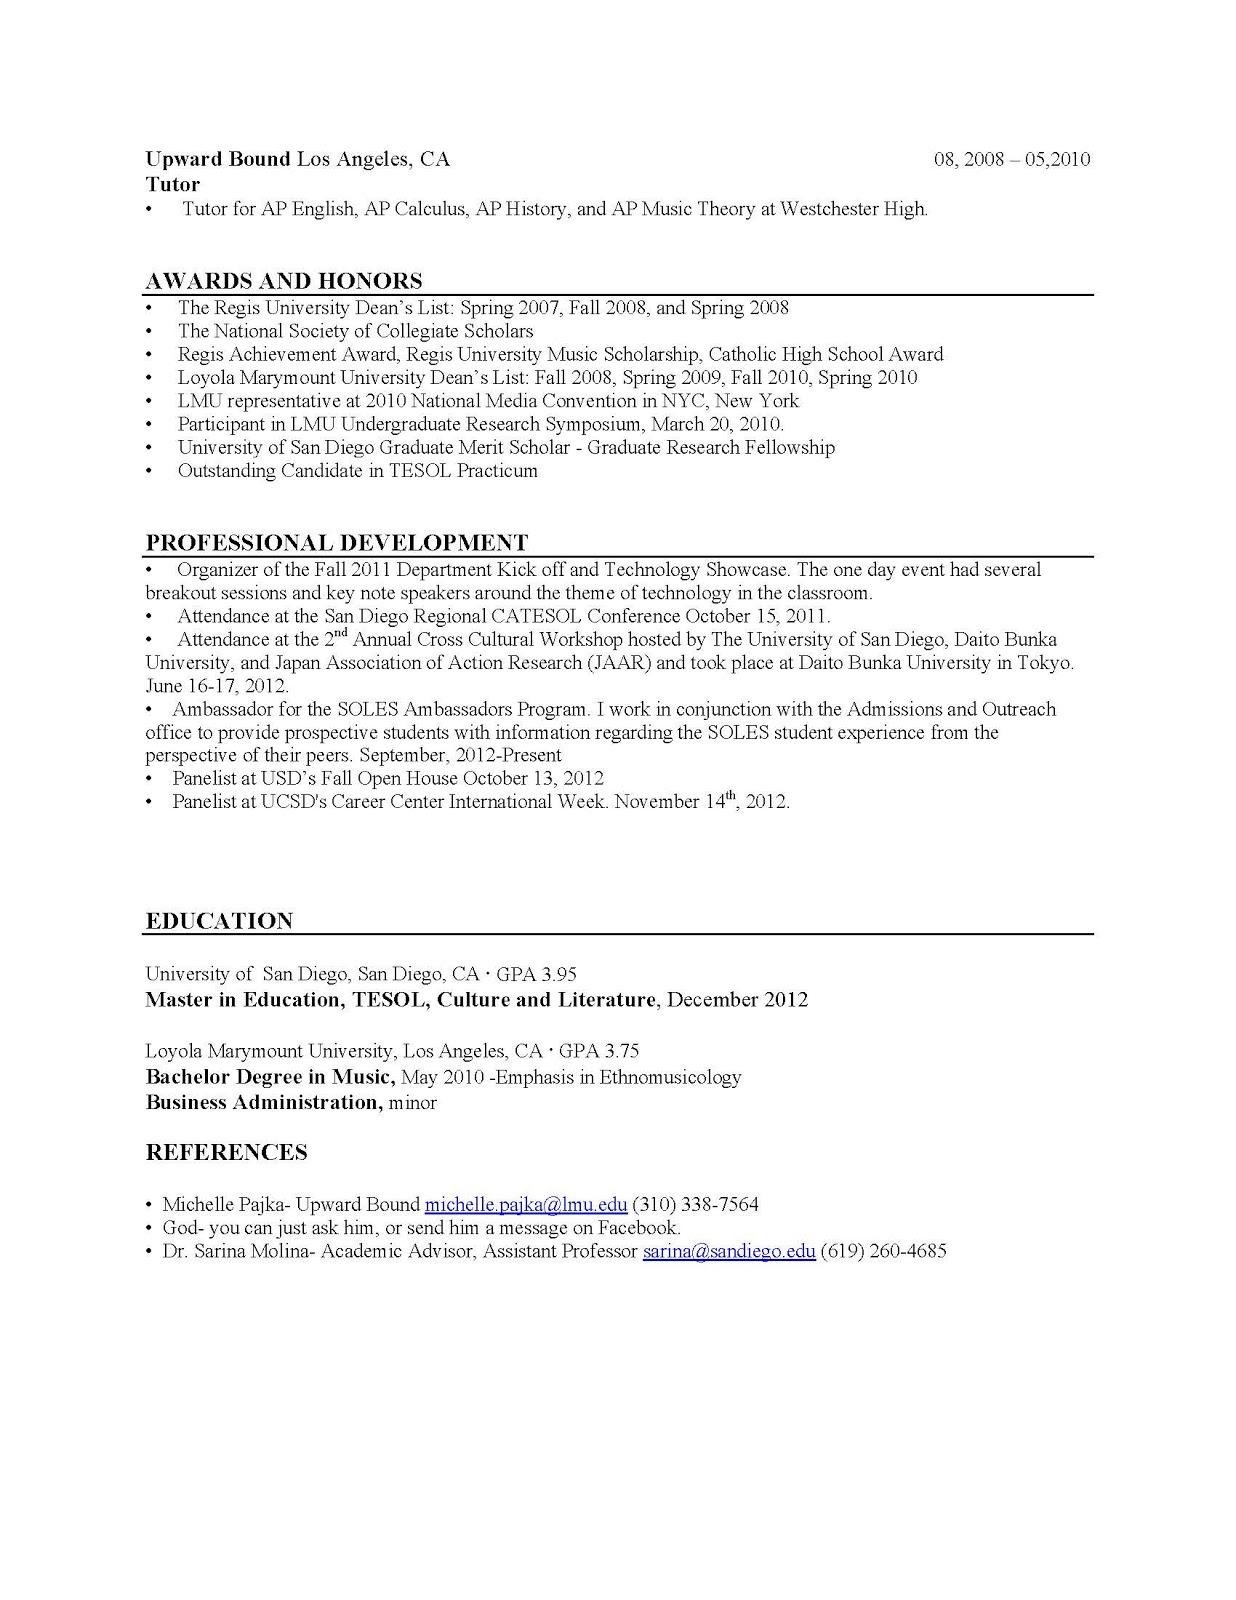 and esol lab workshops resume writing webb